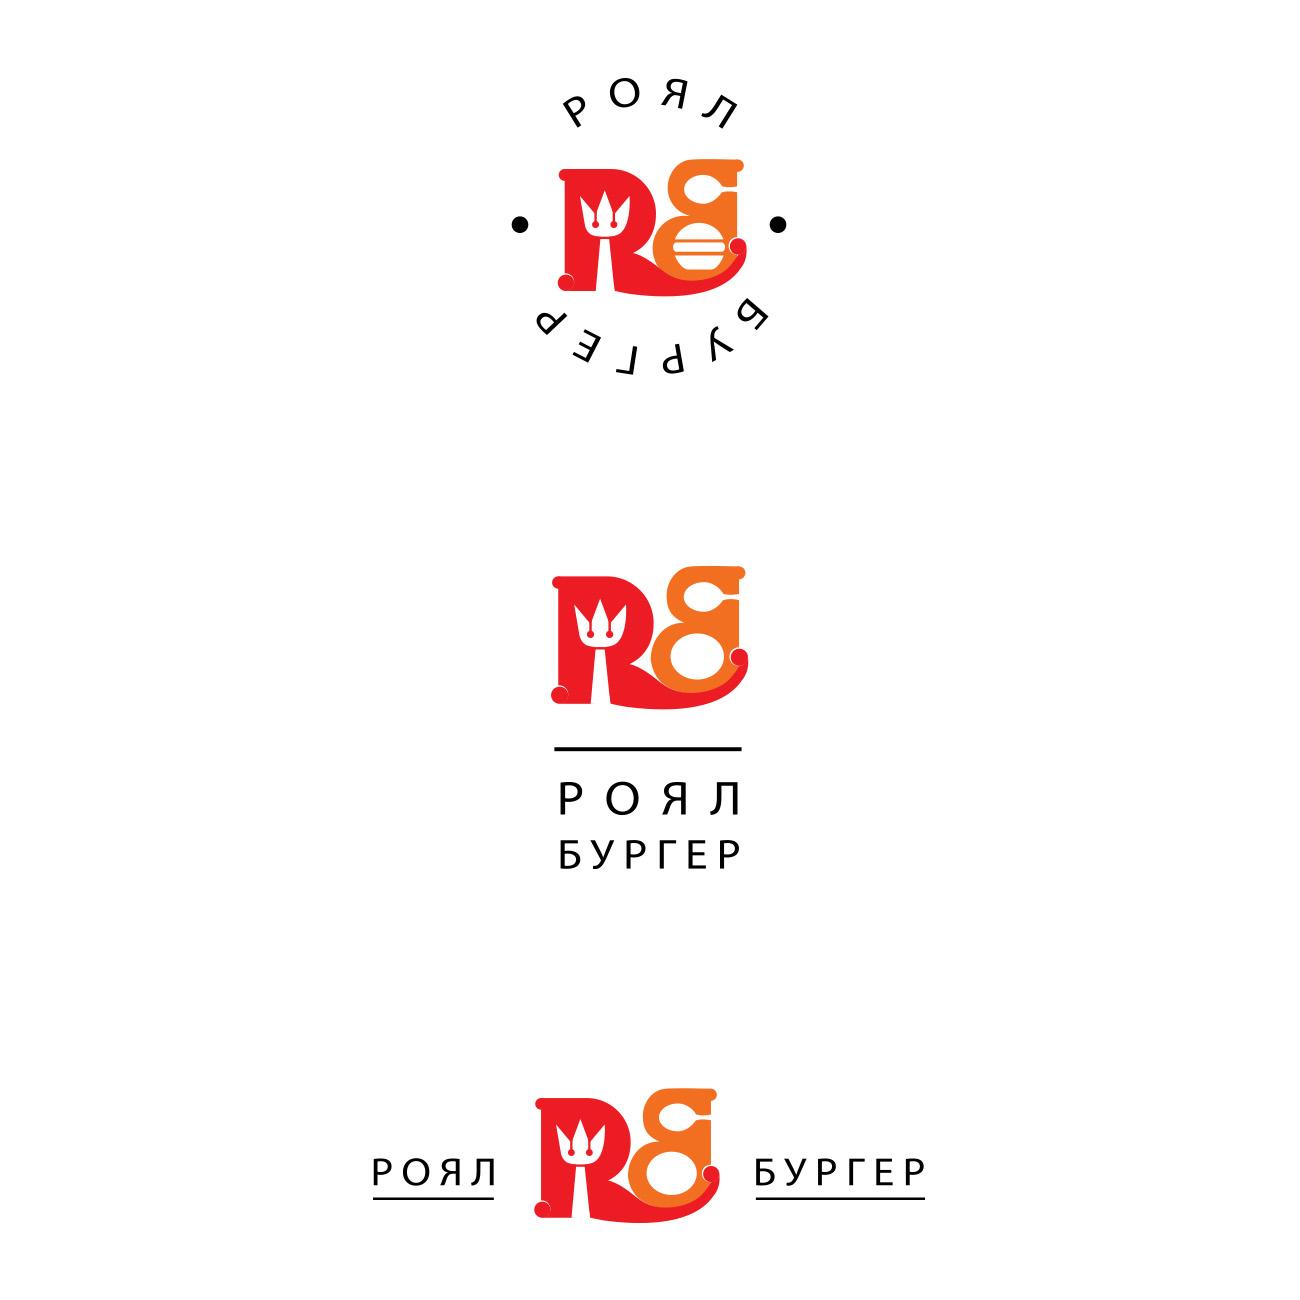 Обновление логотипа фото f_45259c966a3b7beb.jpg